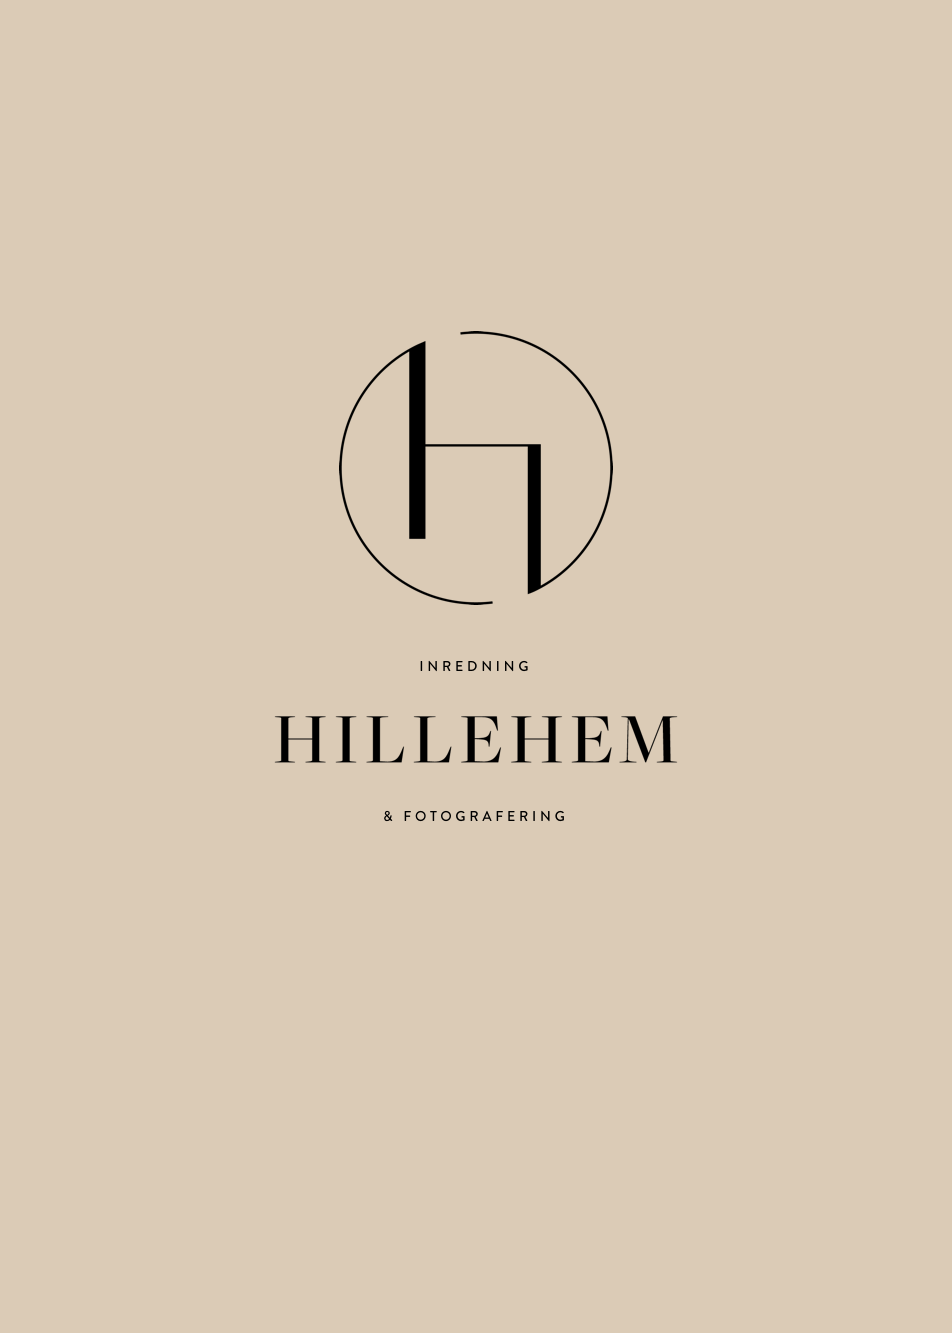 hillehem_logo_view5x7